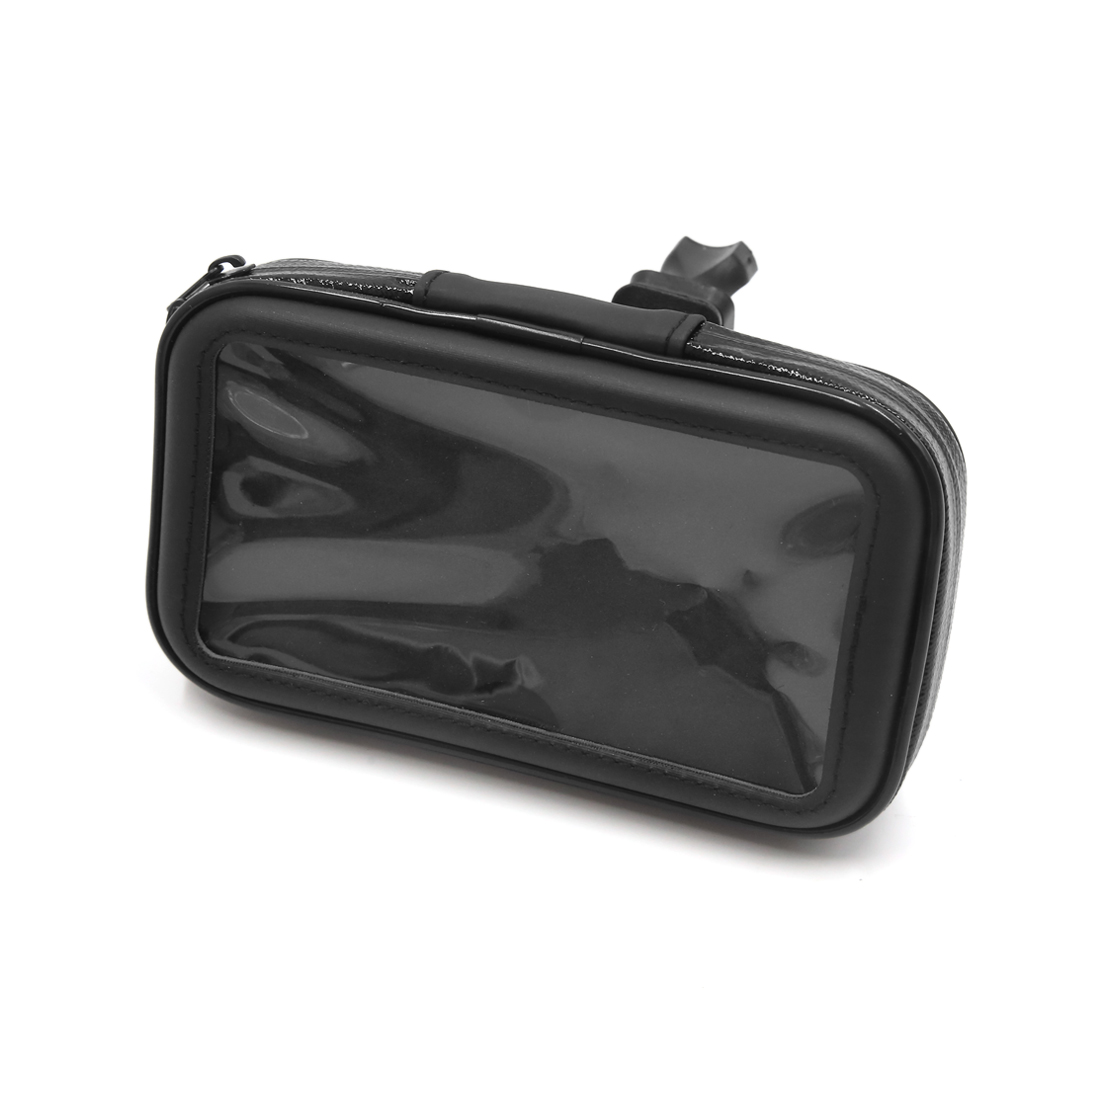 Black Bicycle Bike Handlebar Mount Holder 4.7 Inch Waterproof Phone Bag Case